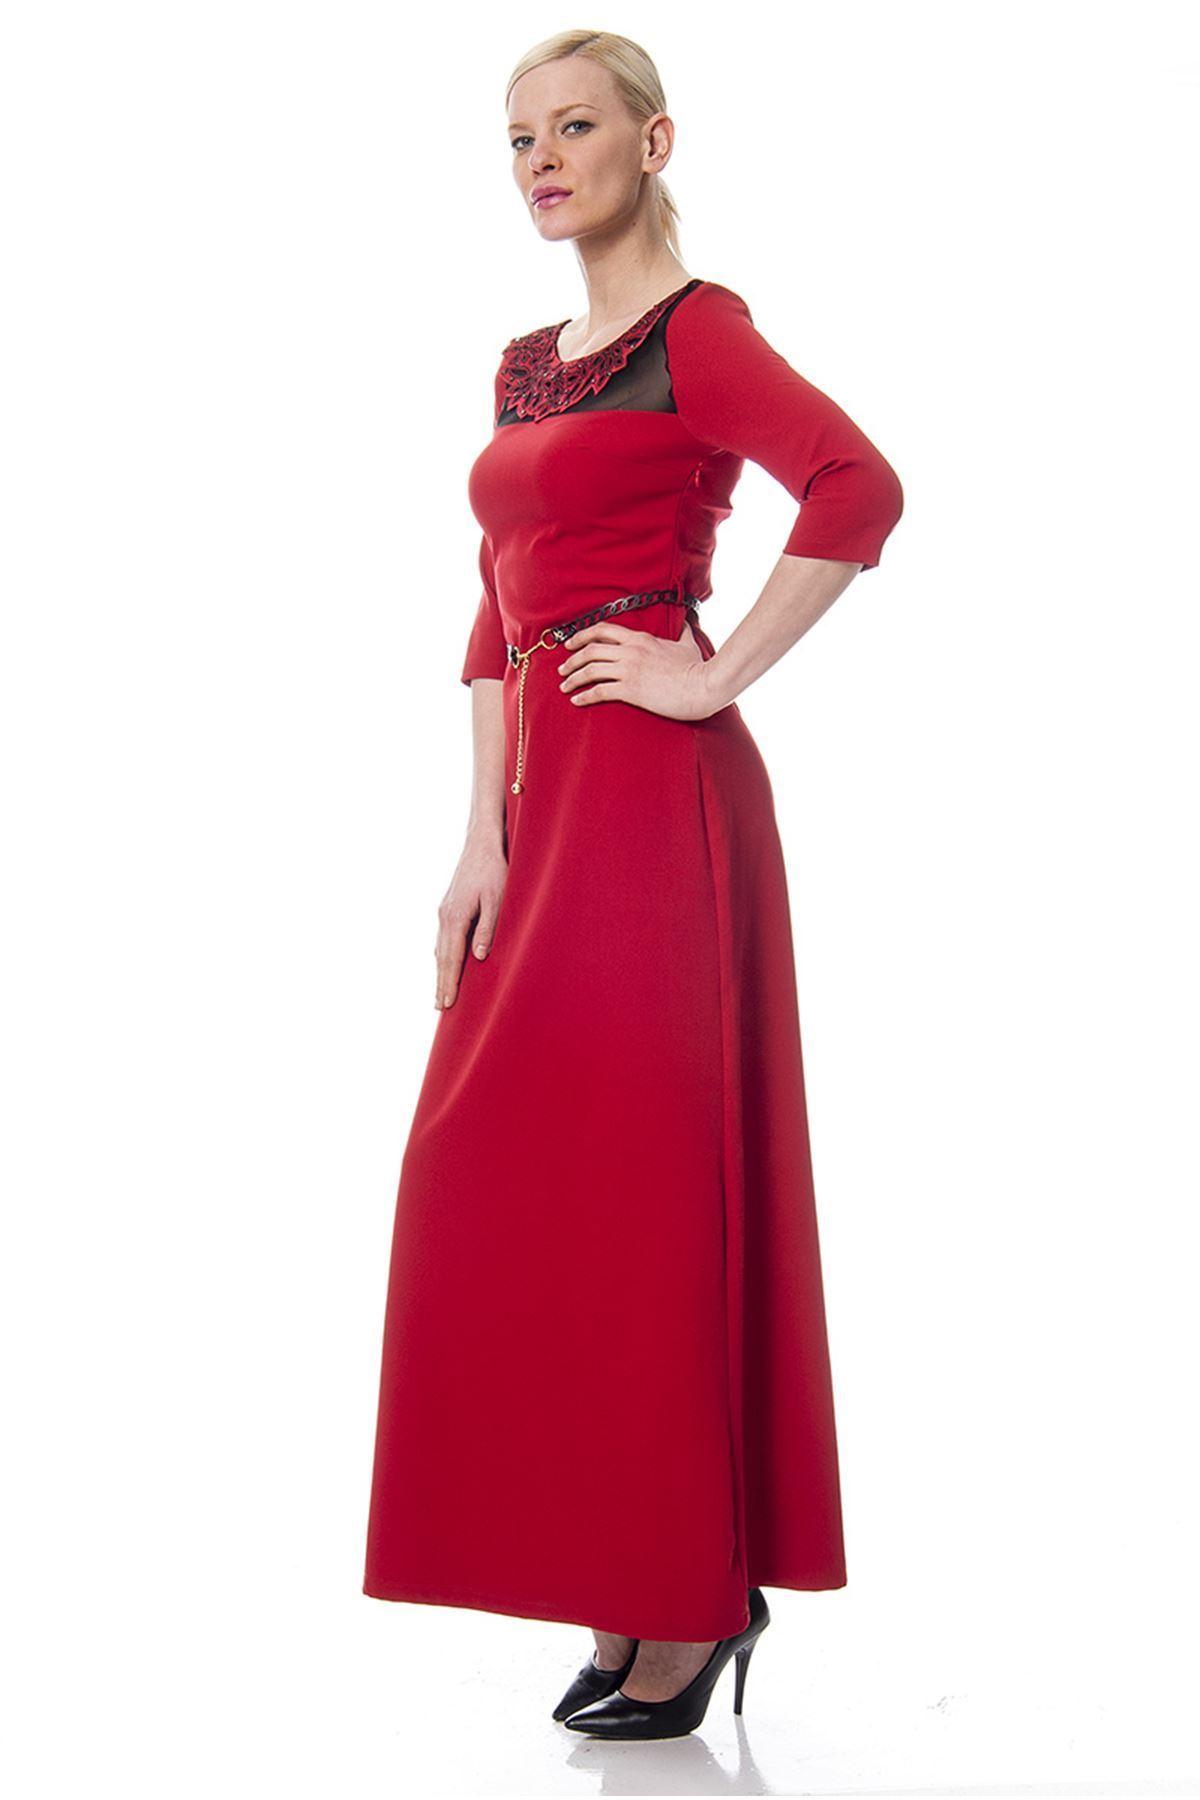 Bordo Yaka İşlemeli Elbise F1-113363